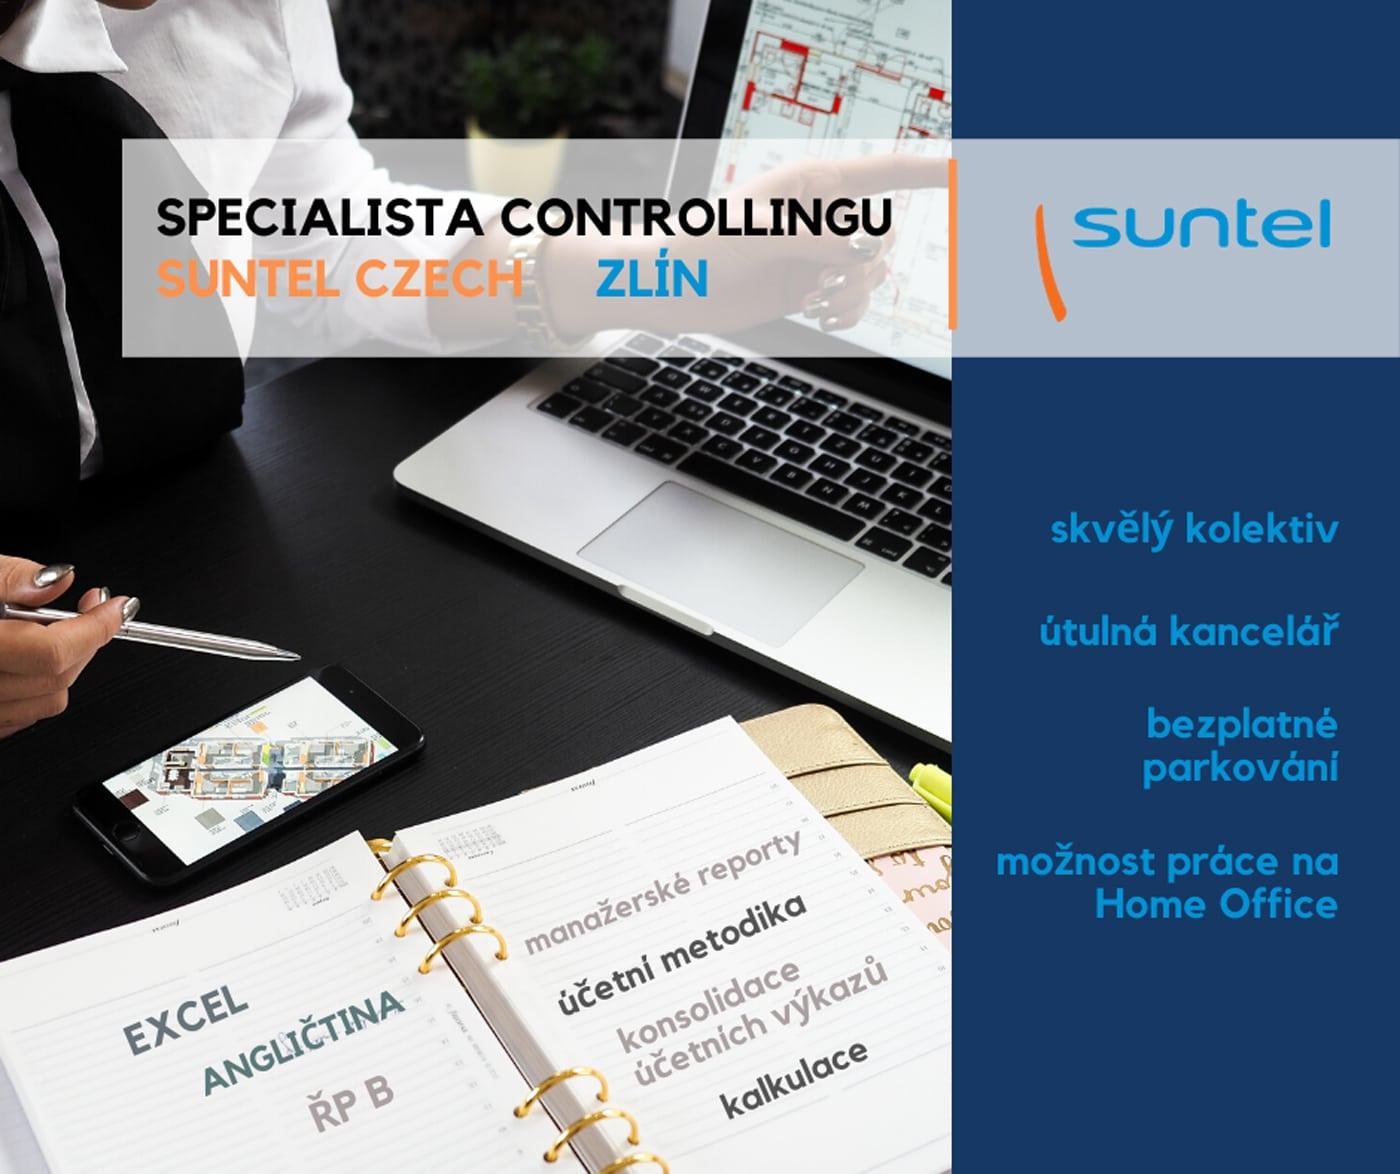 SPECIALISTA-CONTROLLINGU_2